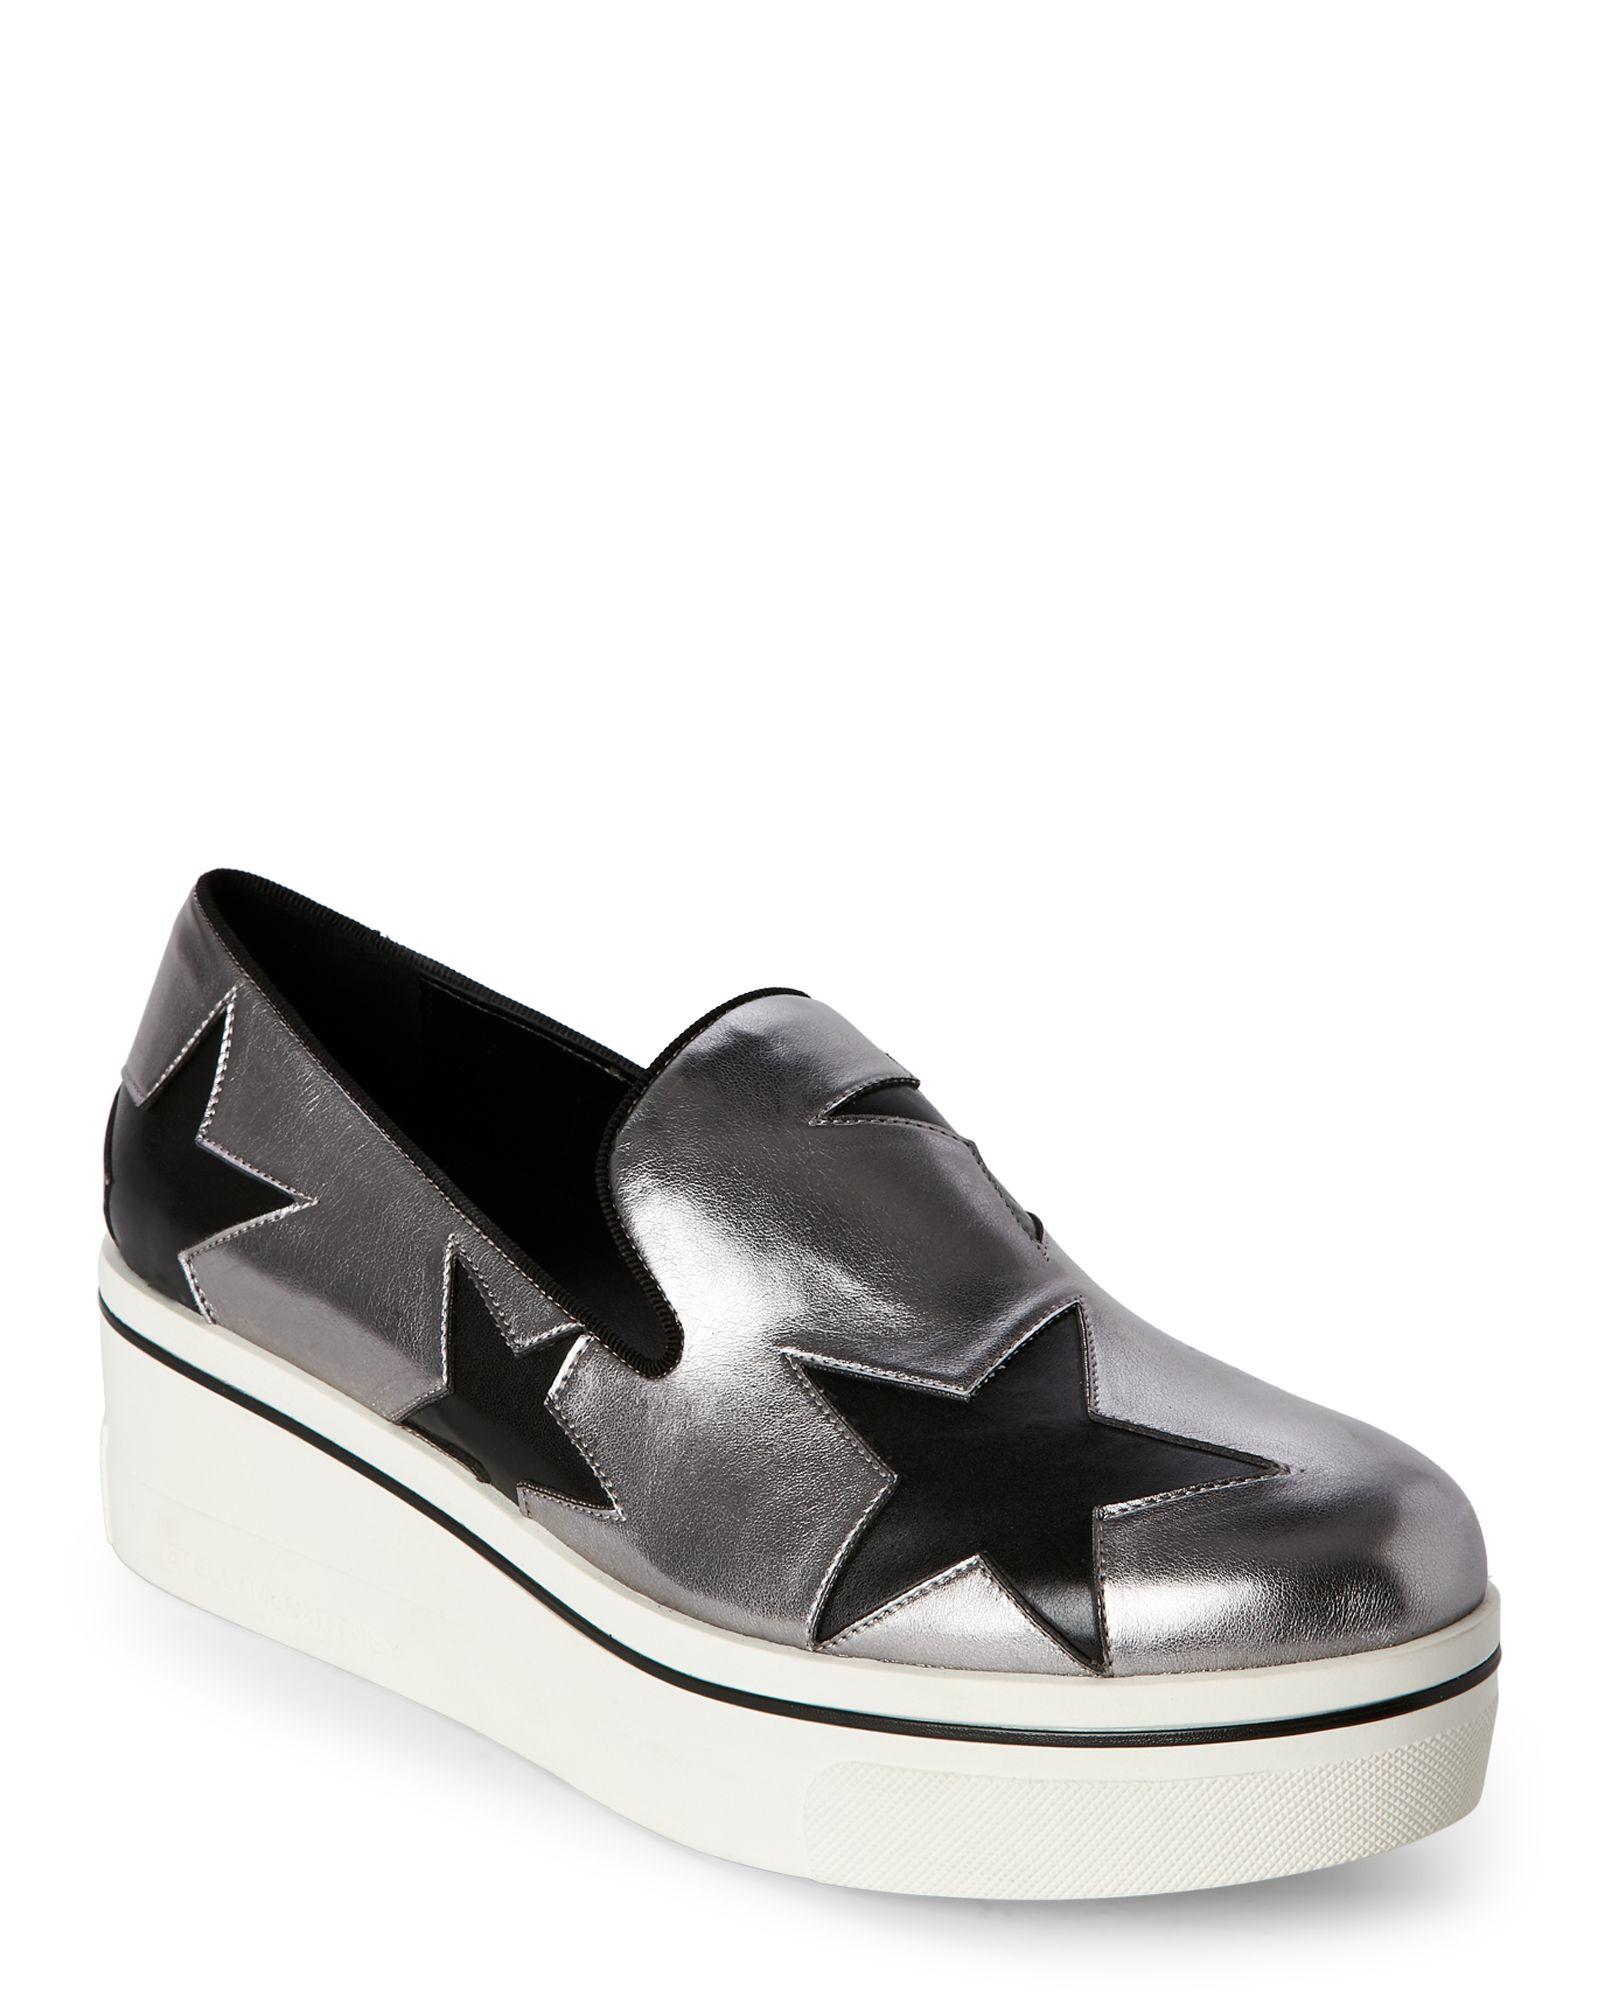 Stella McCartney Black Star Binx Platform Slip-On Sneakers oXPtTTq2Bo